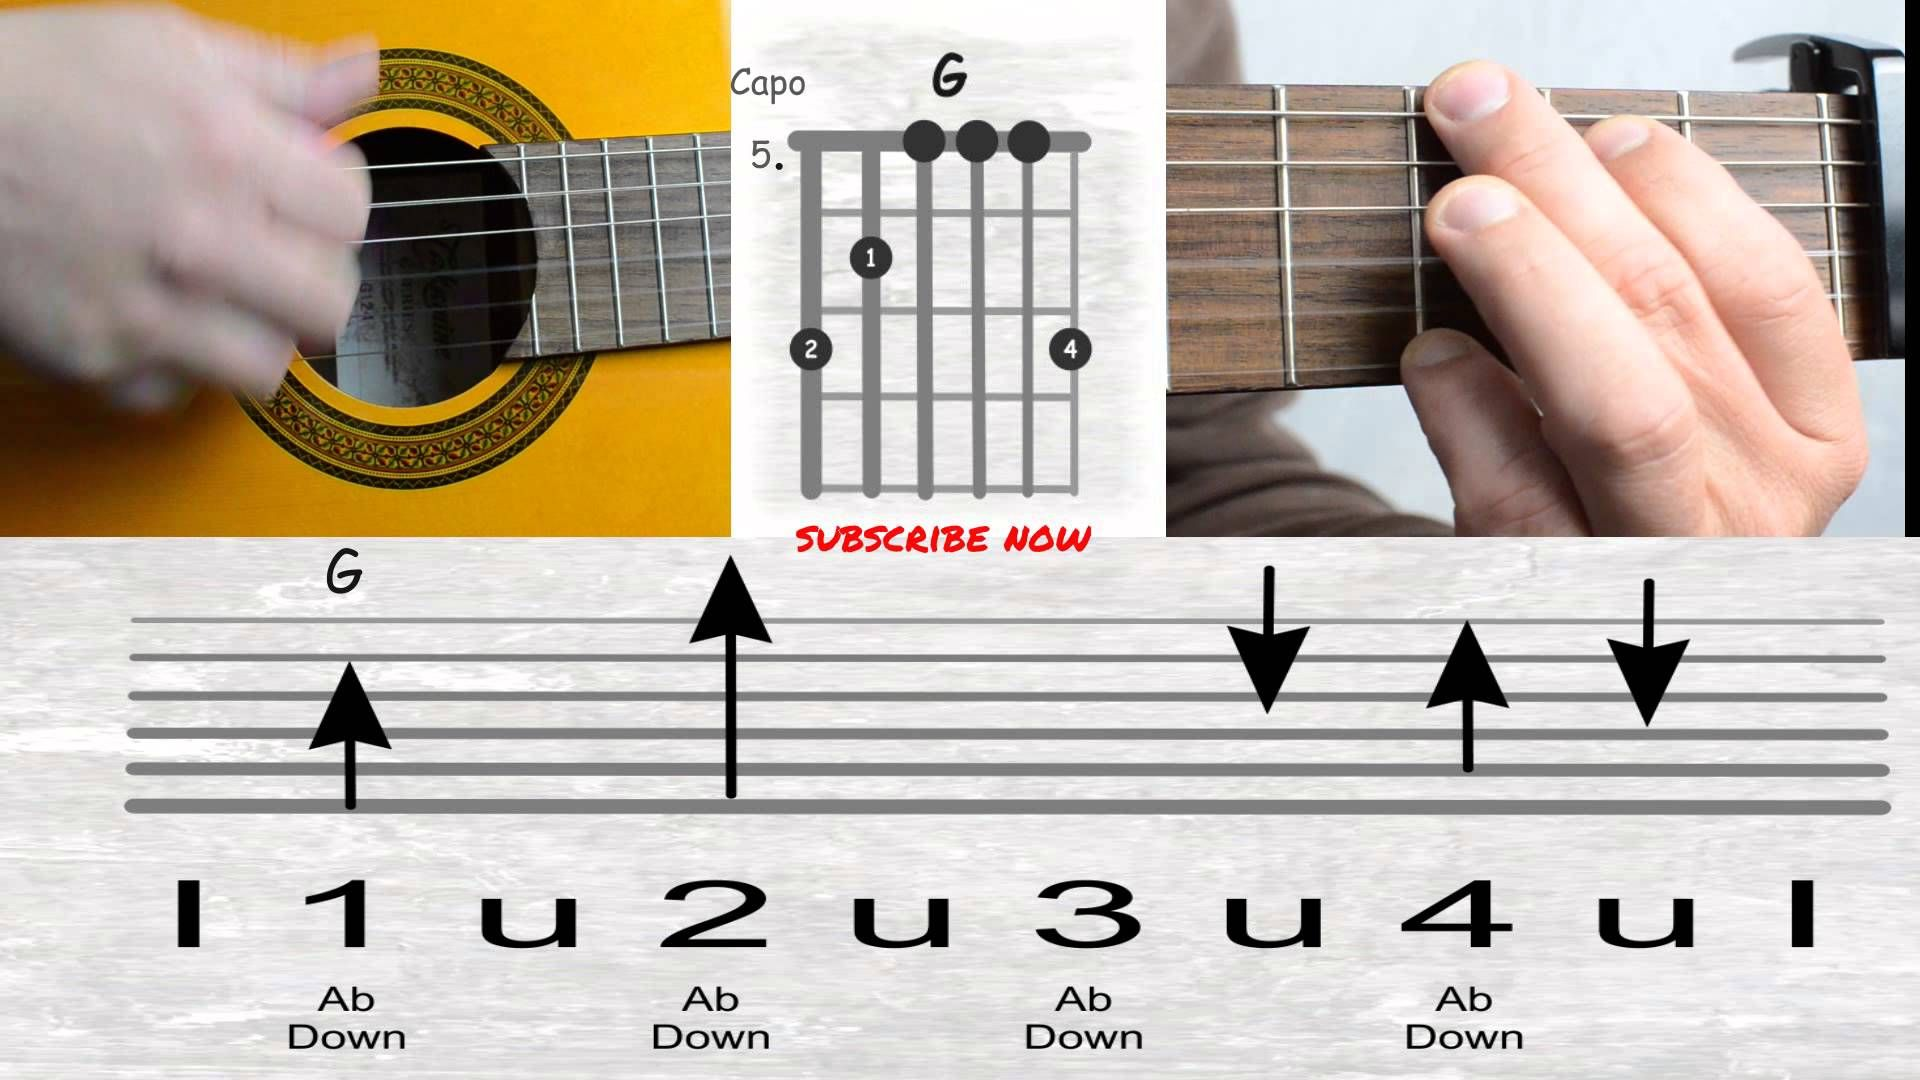 Vance Joy Riptide Tutorial Guitar Lesson Chords Lyrics Guitar